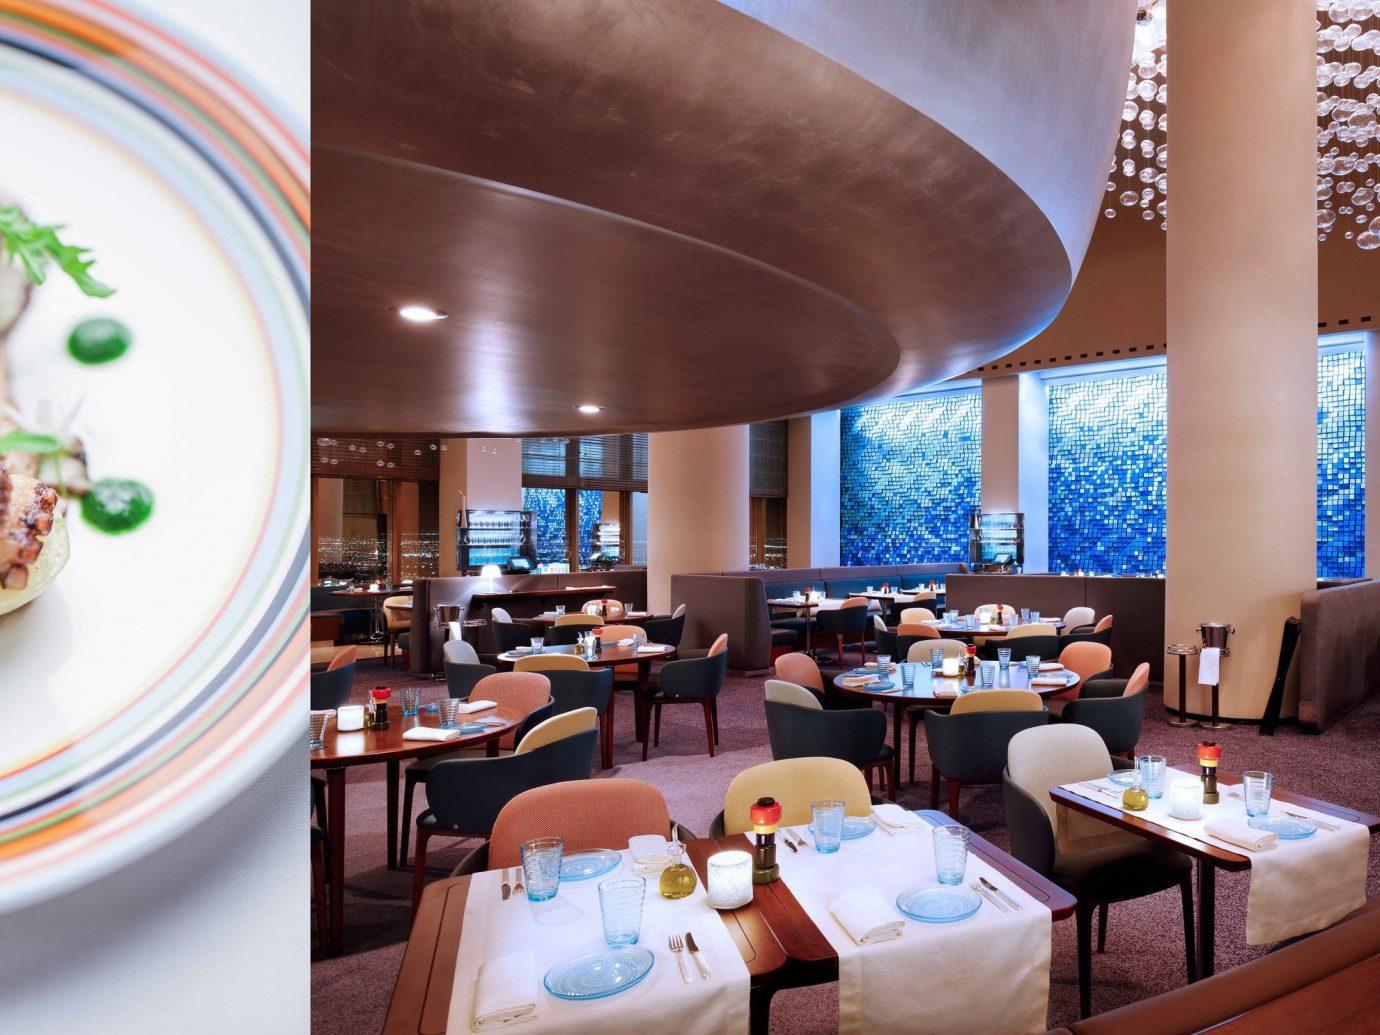 Food + Drink table indoor plate meal restaurant brunch function hall lunch Resort several